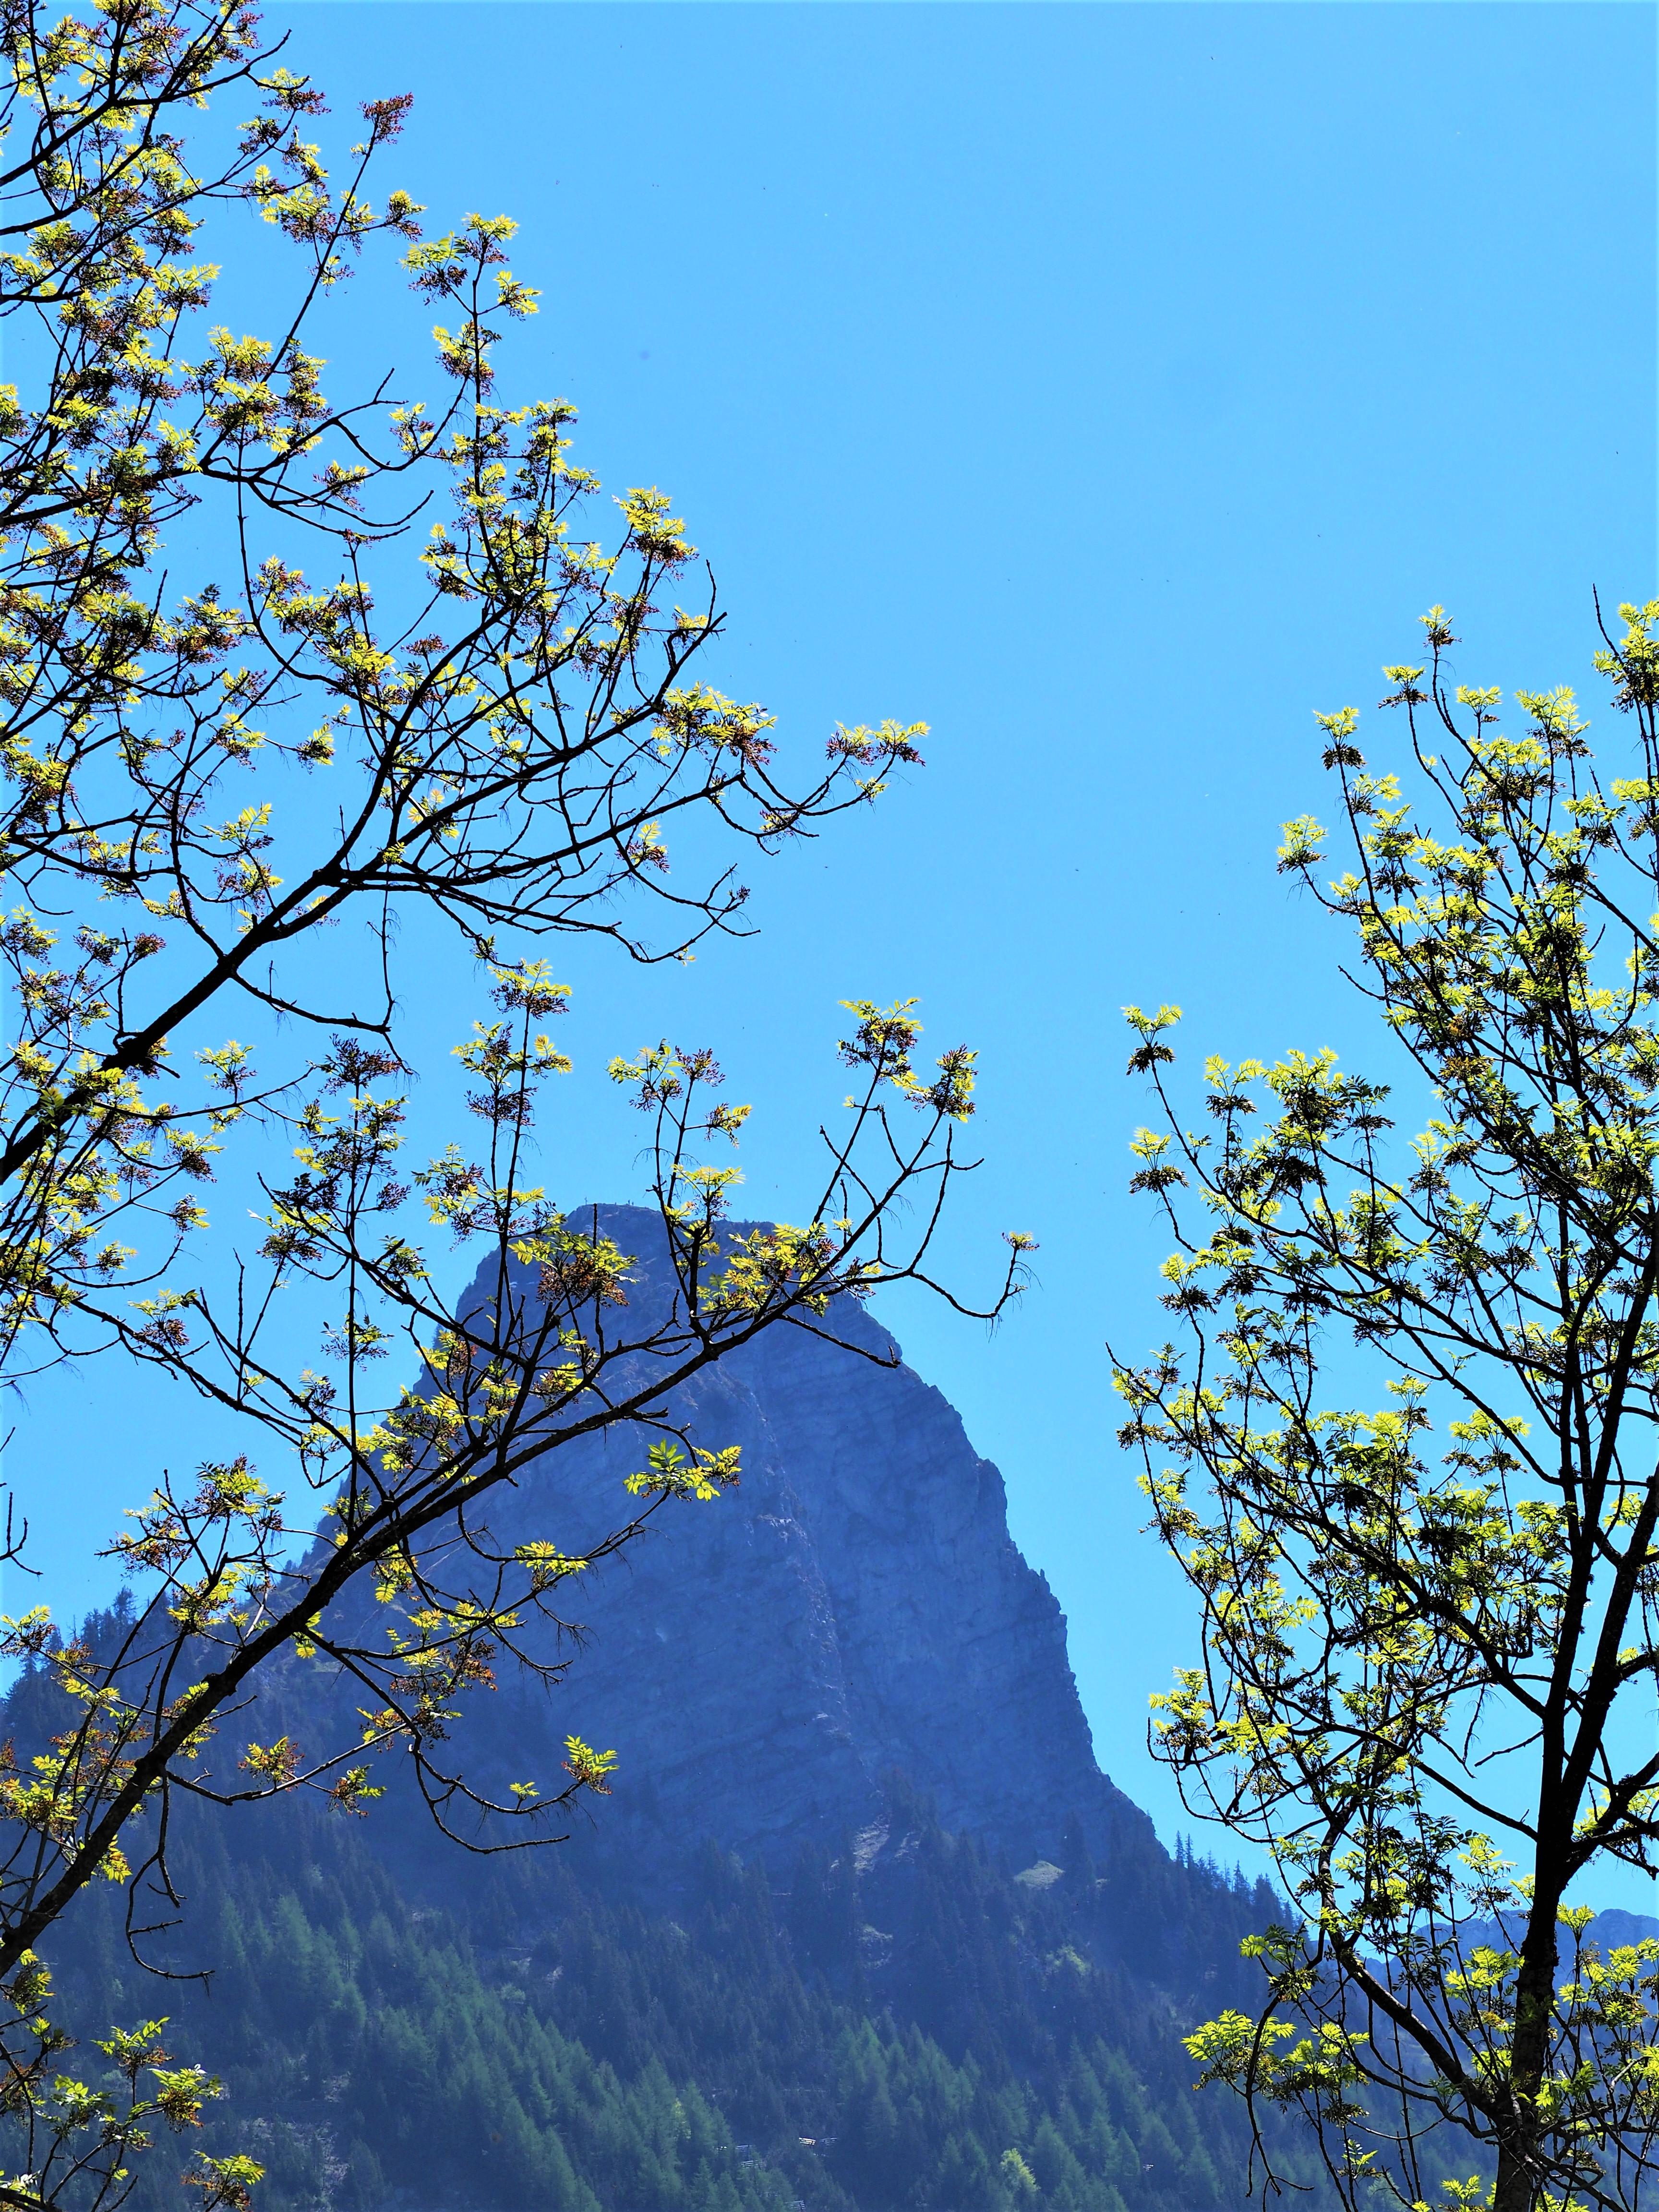 Dent de jaman lausanne balade suisse blog voyage clioandco